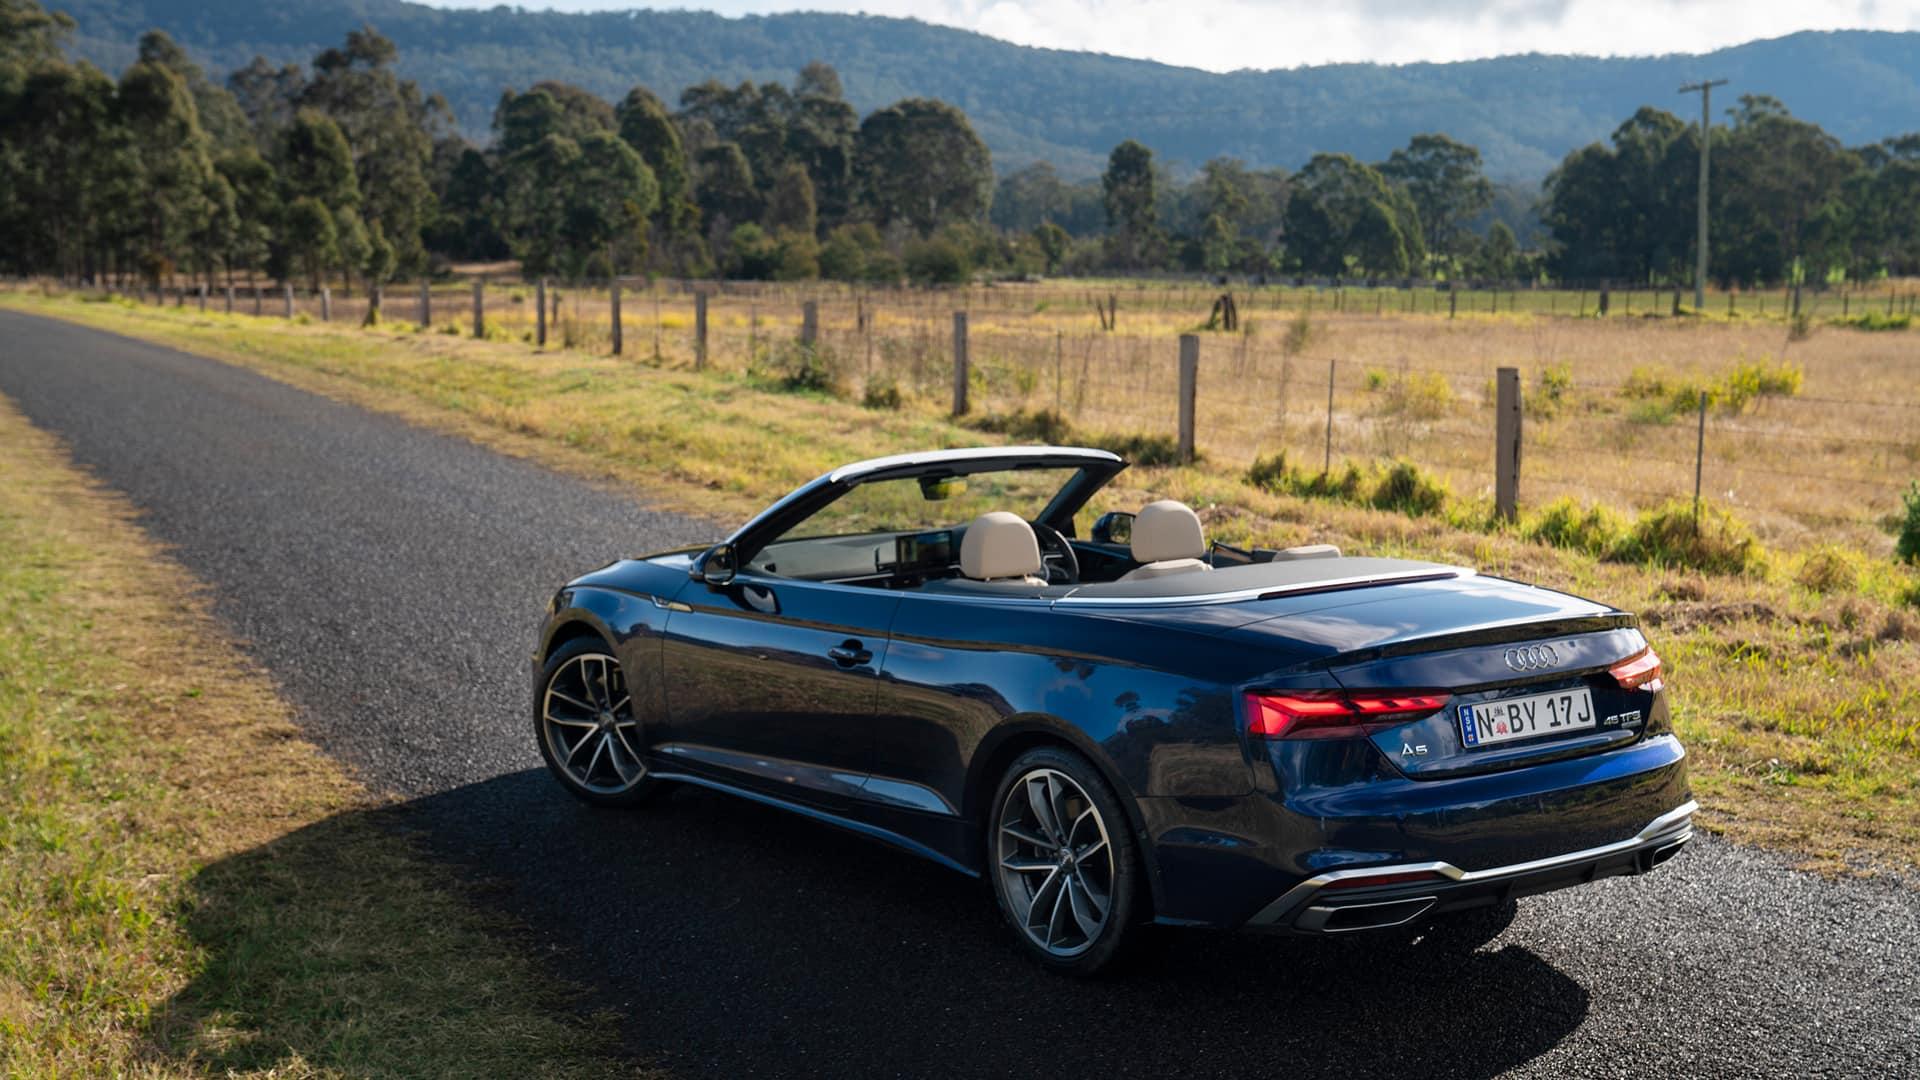 Audi A5 Cabriolet Alluring Convertible Audi Australia